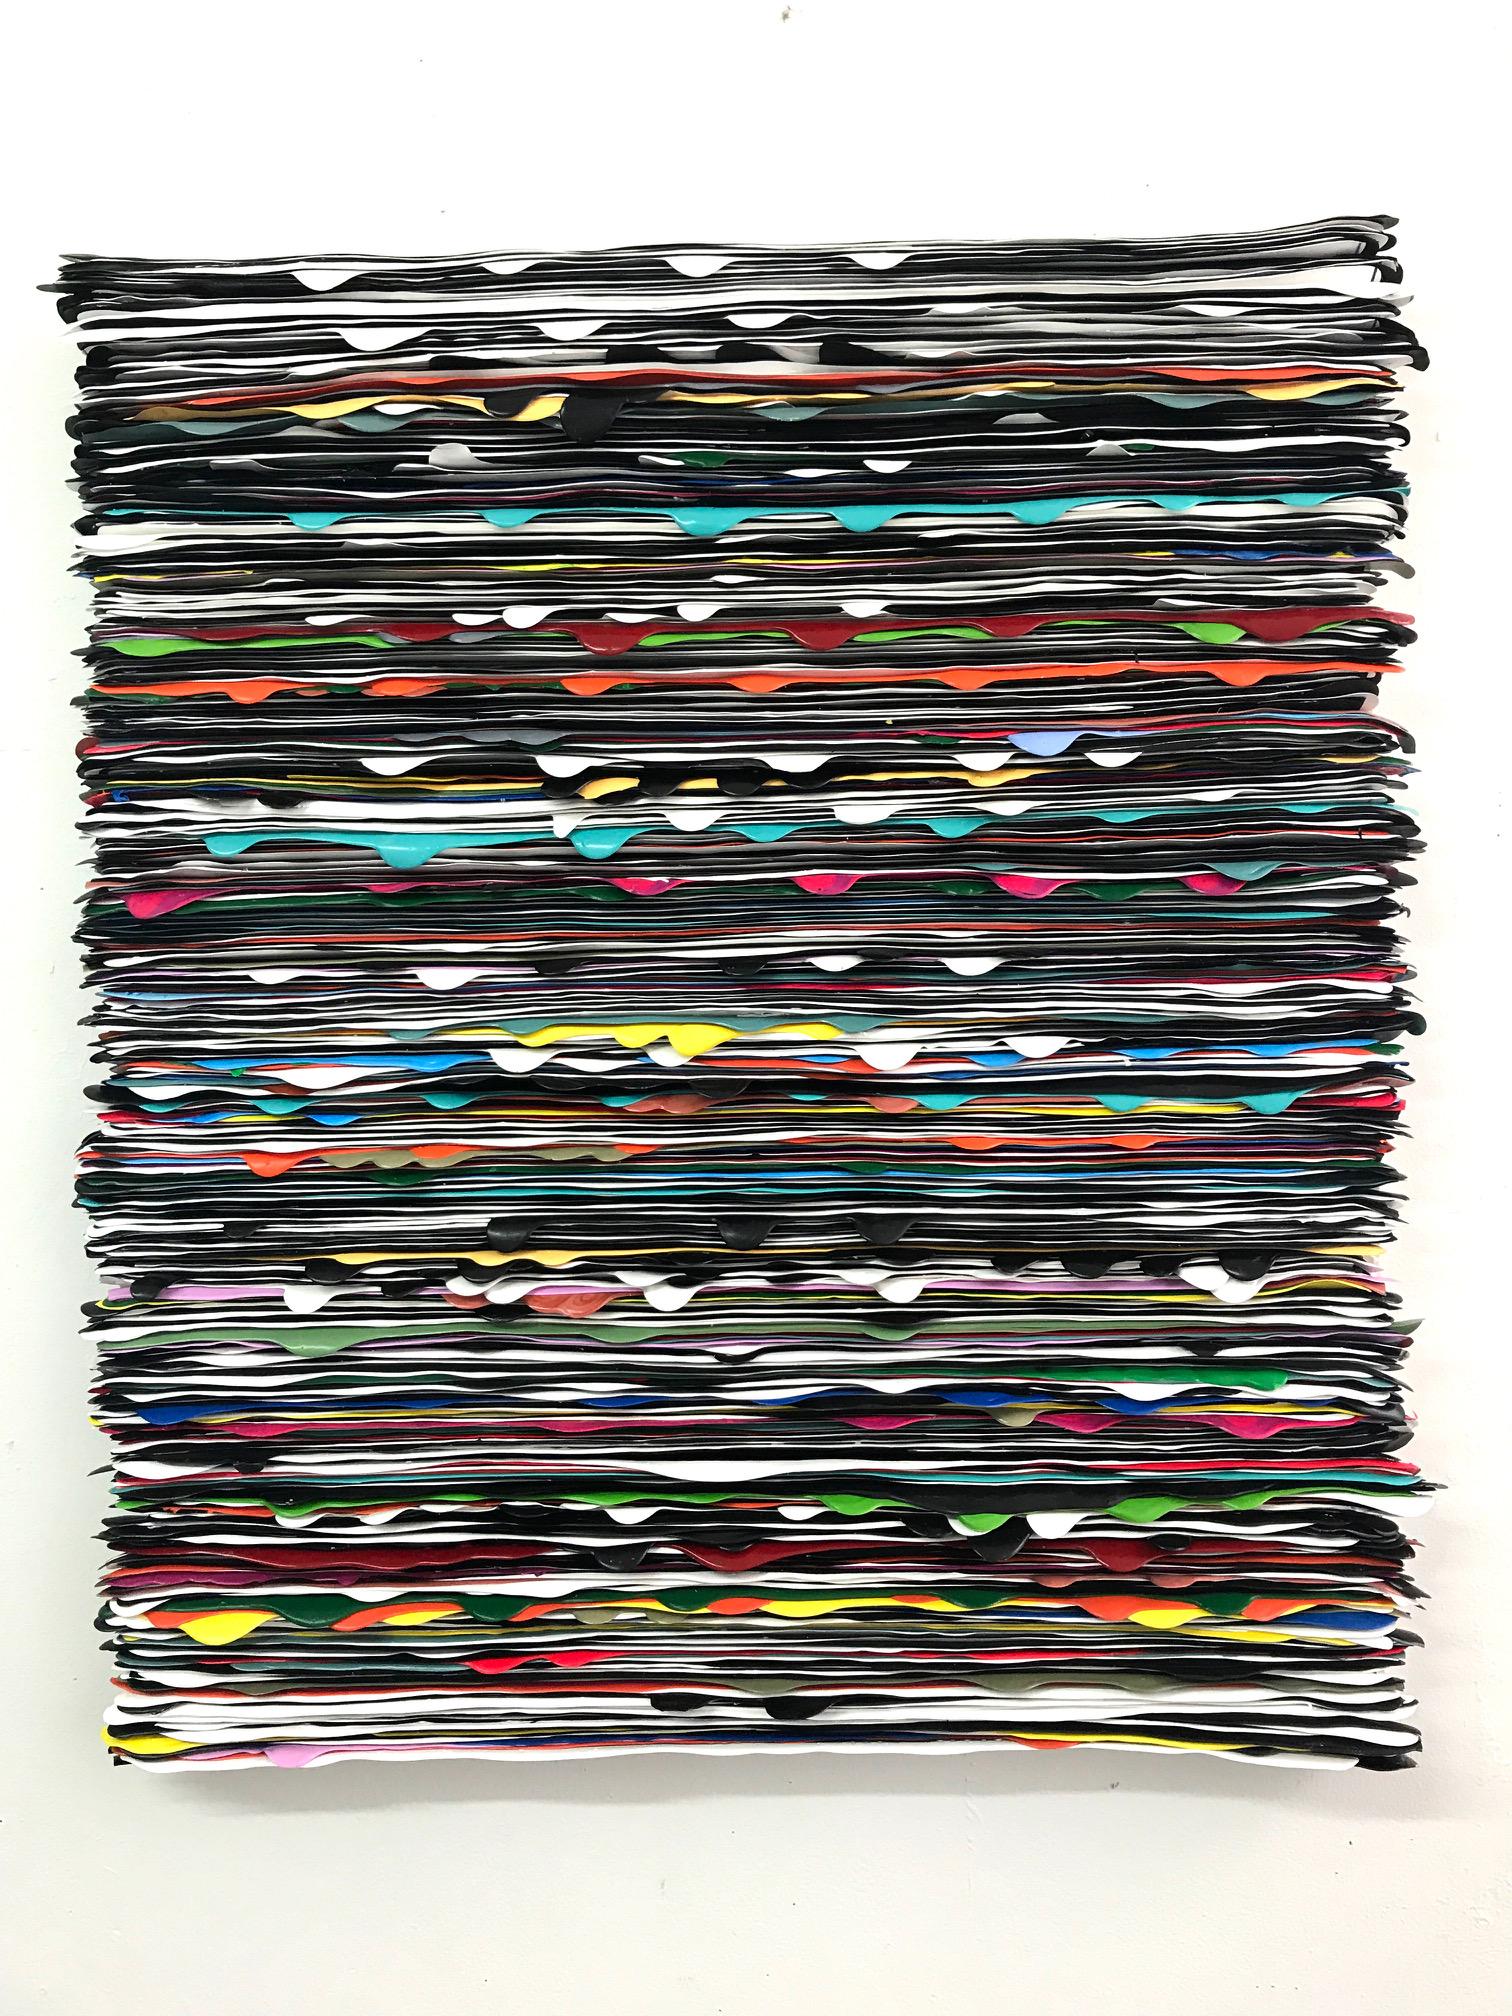 Monica Delgado, What's a Painting No. 19, 2017